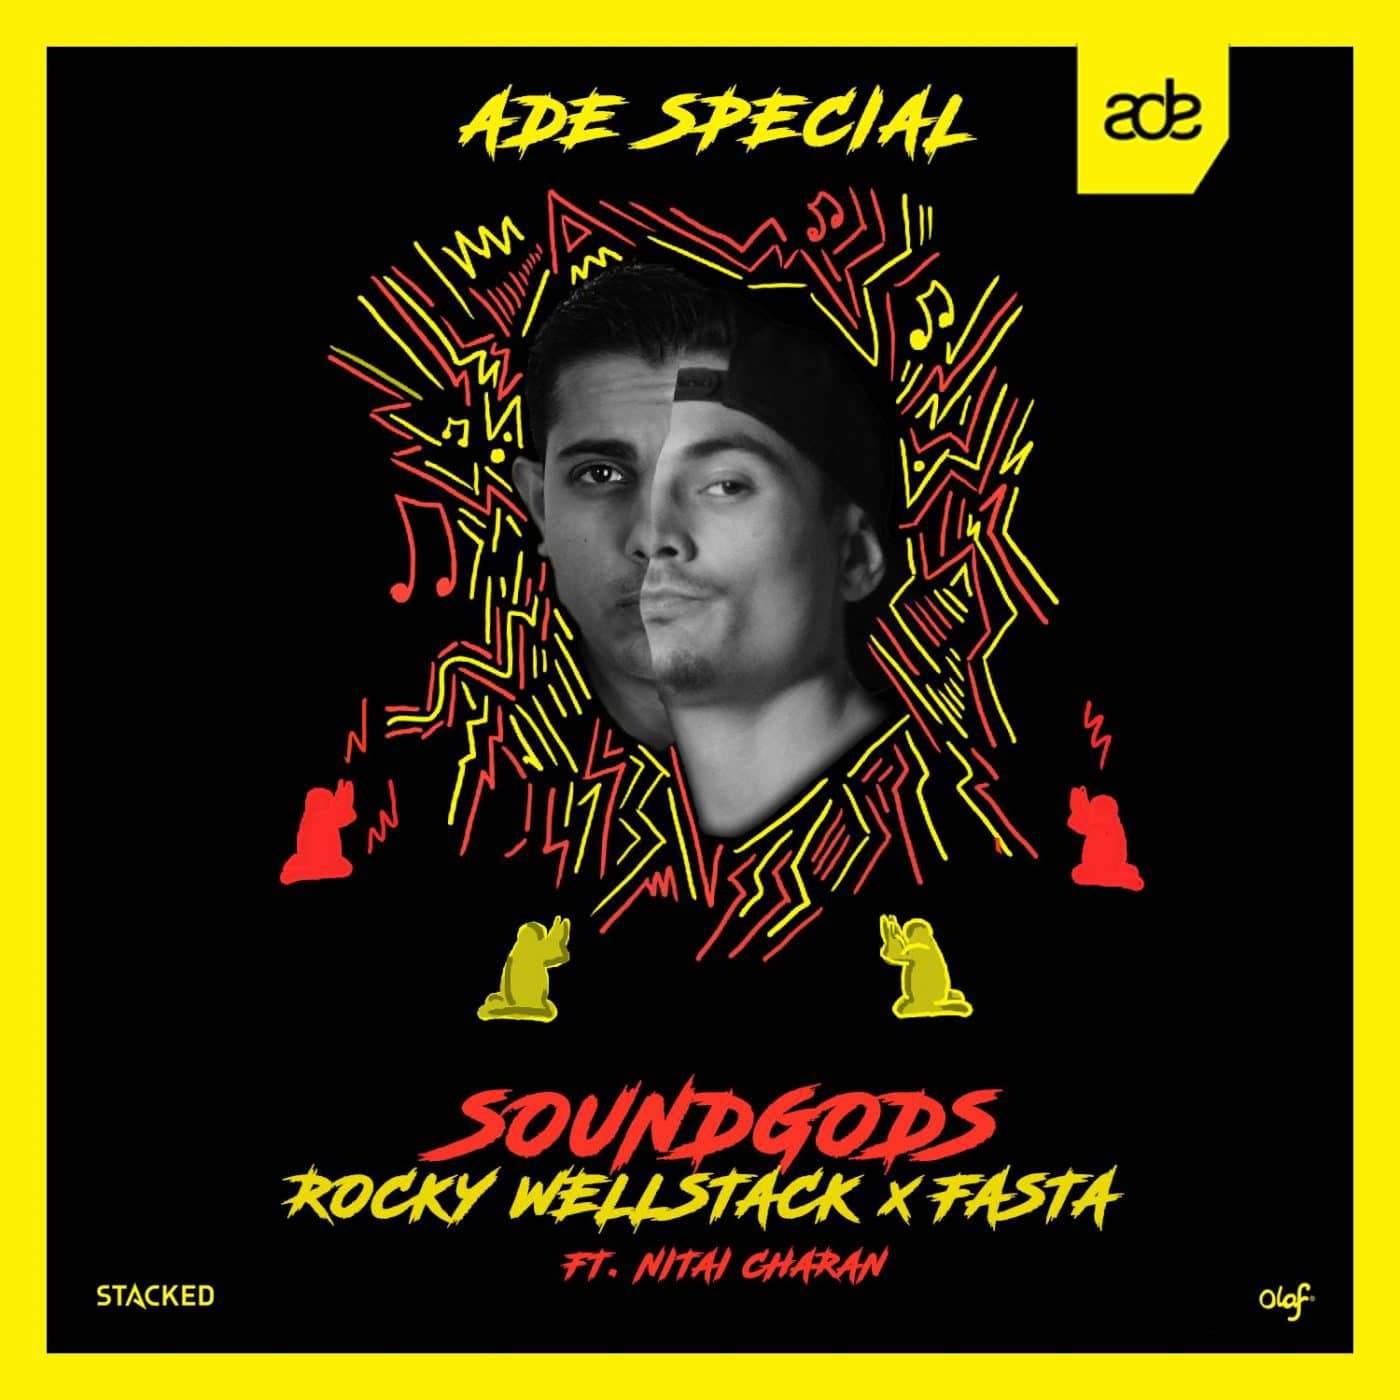 Rocky Wellstack x Fasta x Nitai Charan - Soundgods (ADE Special)